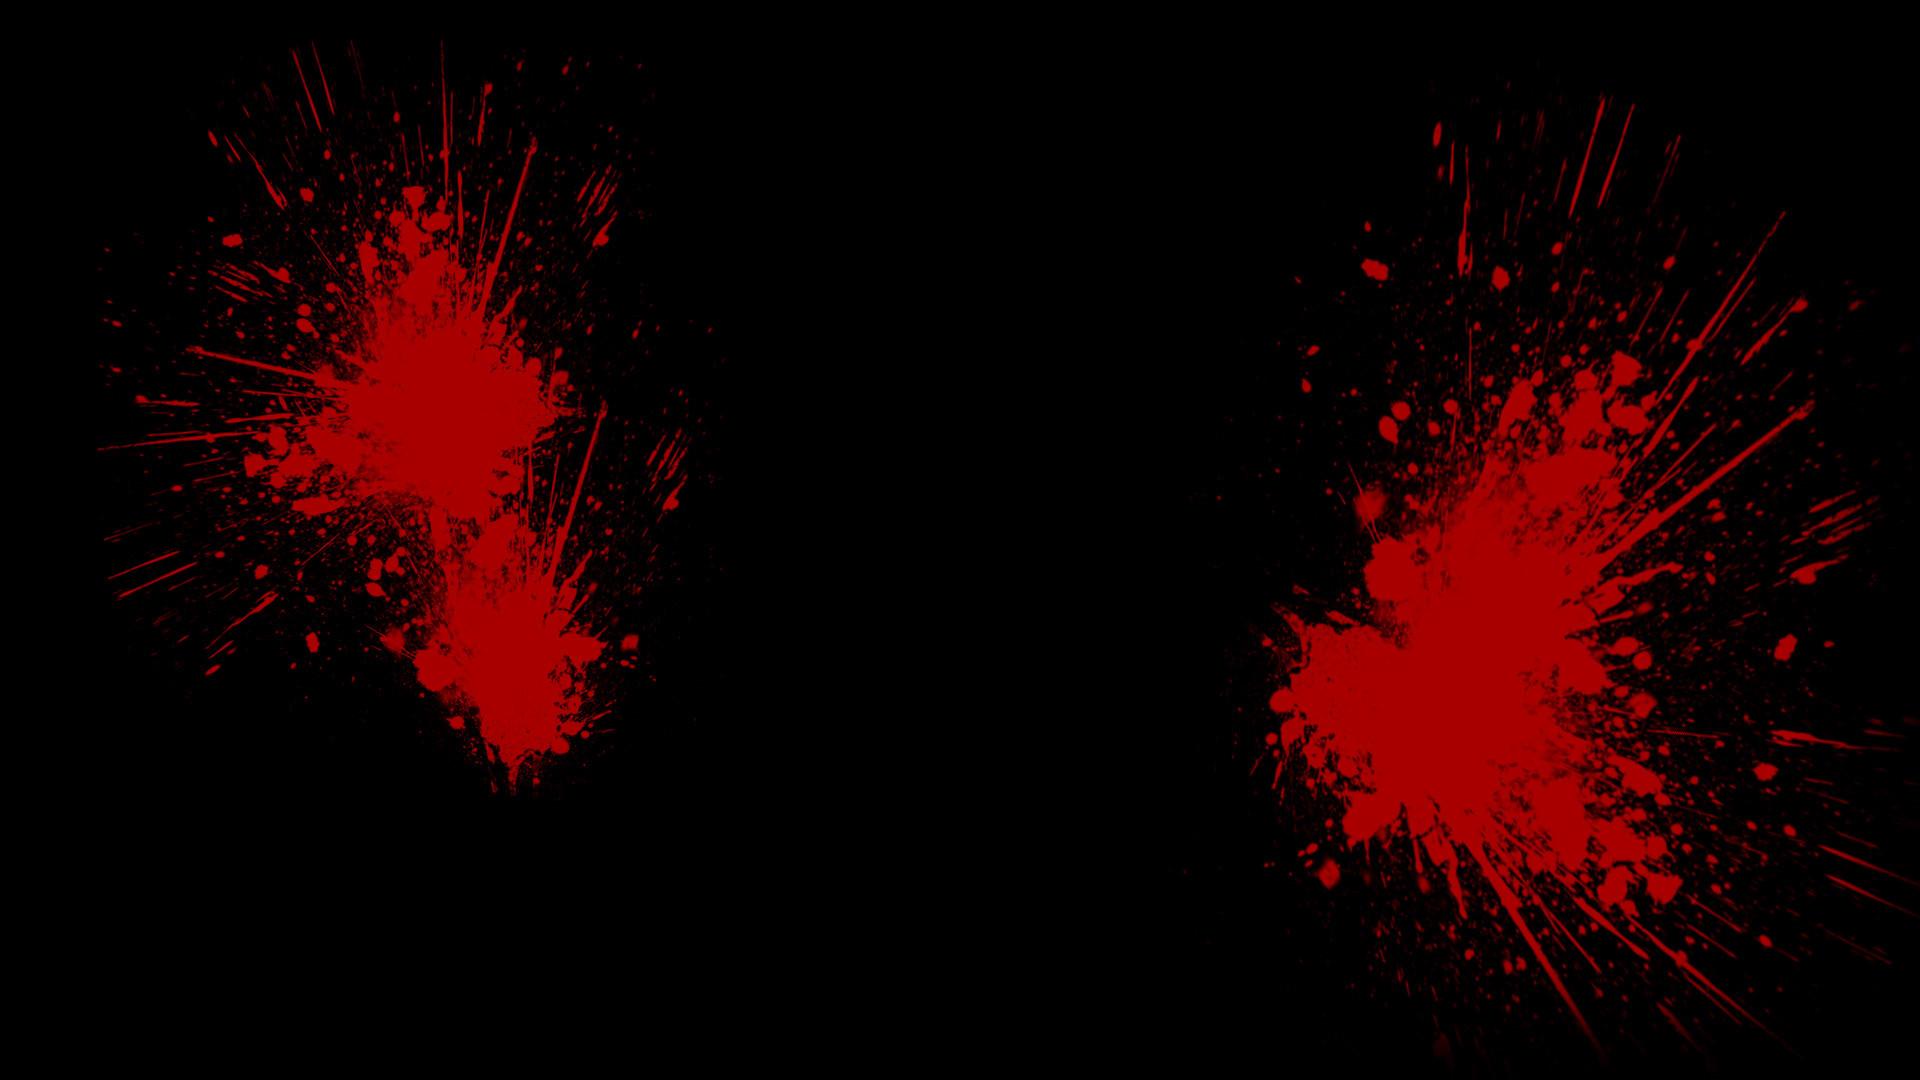 Крутые картинки черный фон красная краска для пацанов